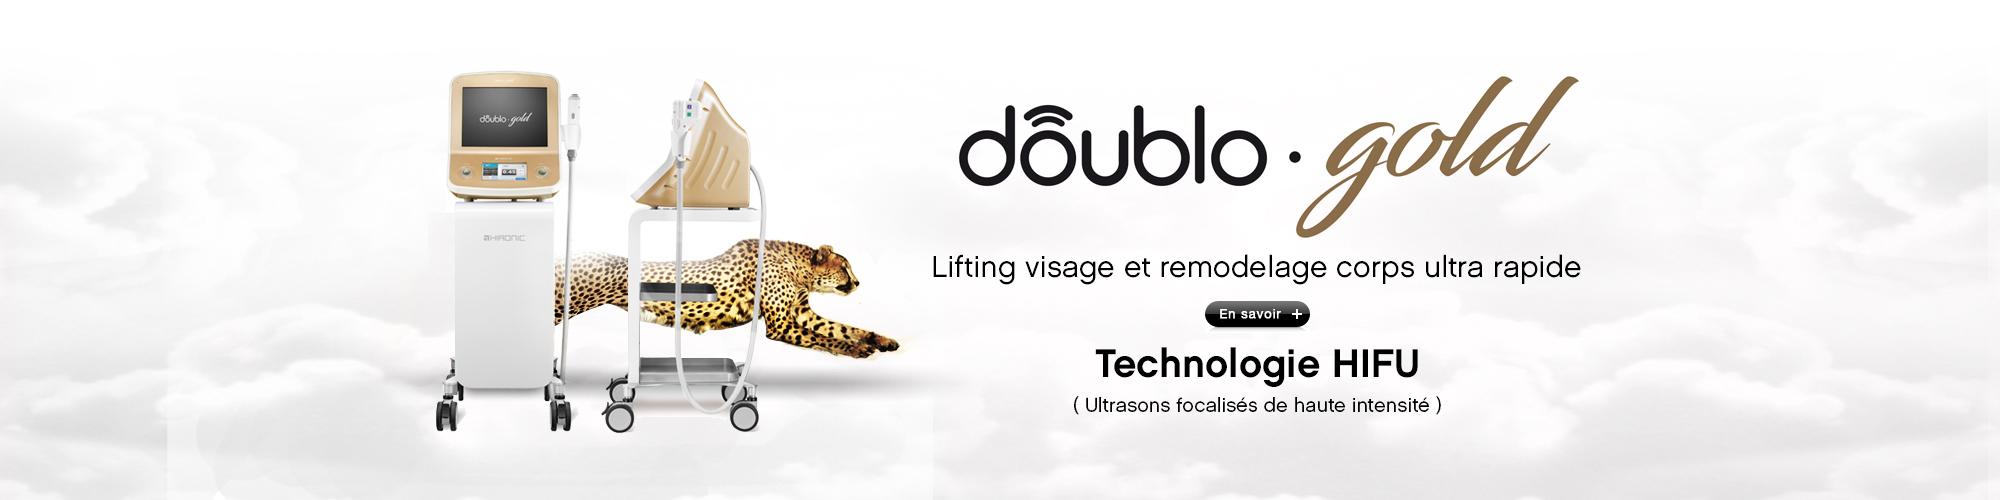 https://www.capactuel.com/storage/app/media/Carousel/accueil/caroussel-doublo.jpg